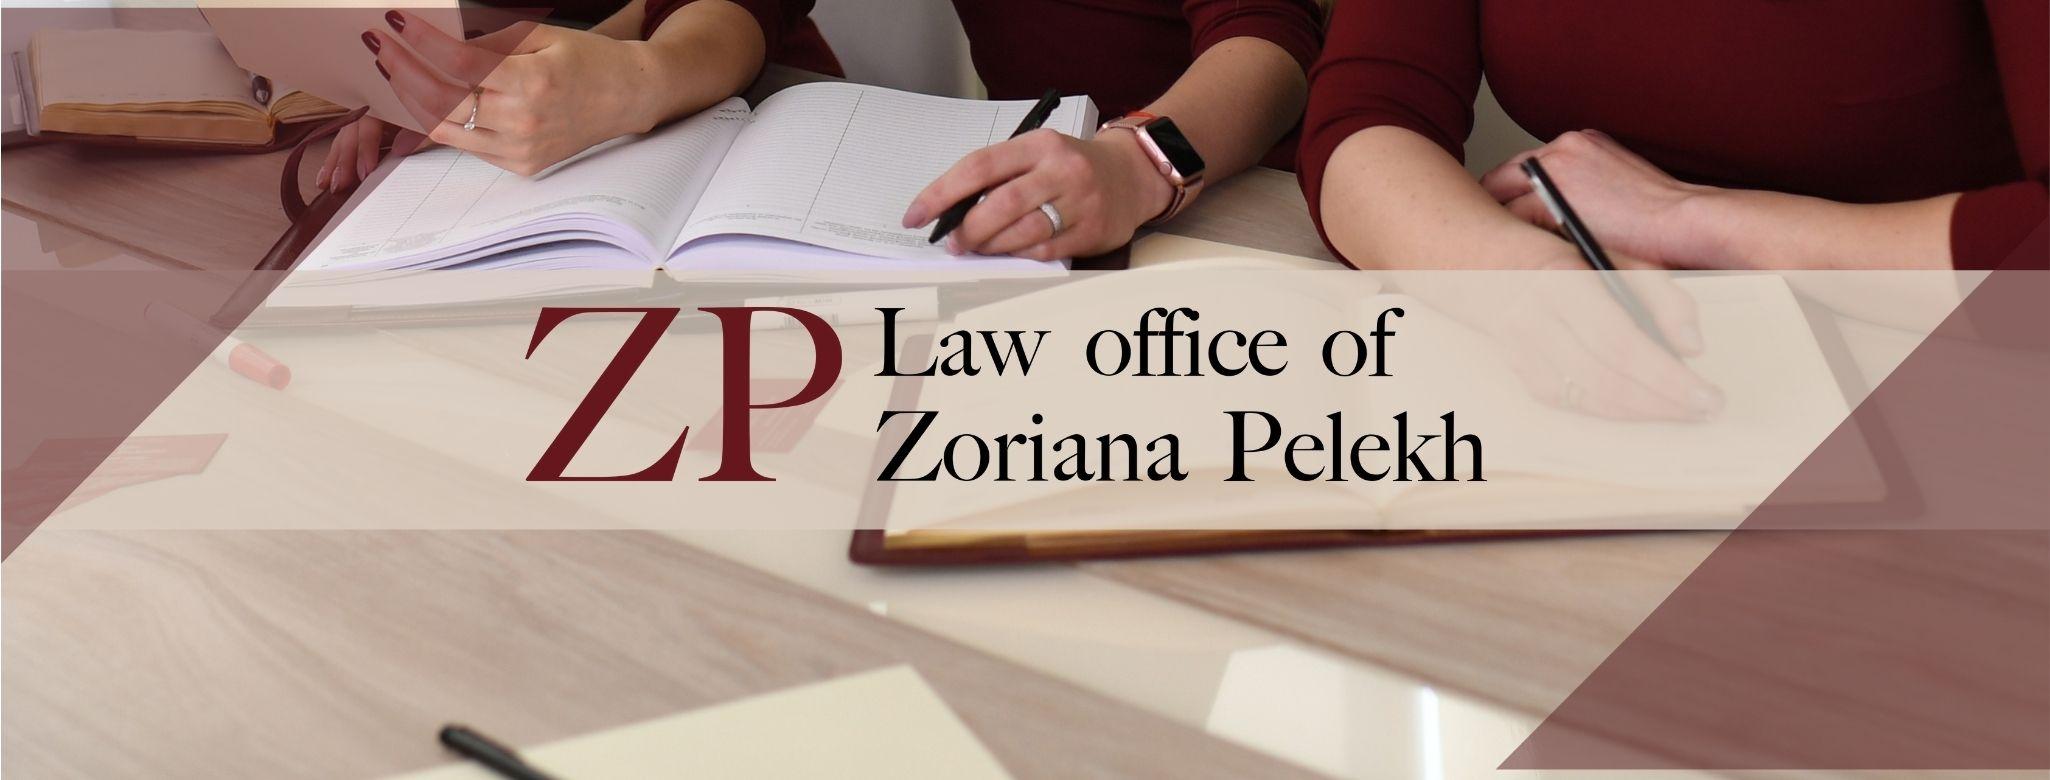 ZP Law office of Zoriana Pelekh